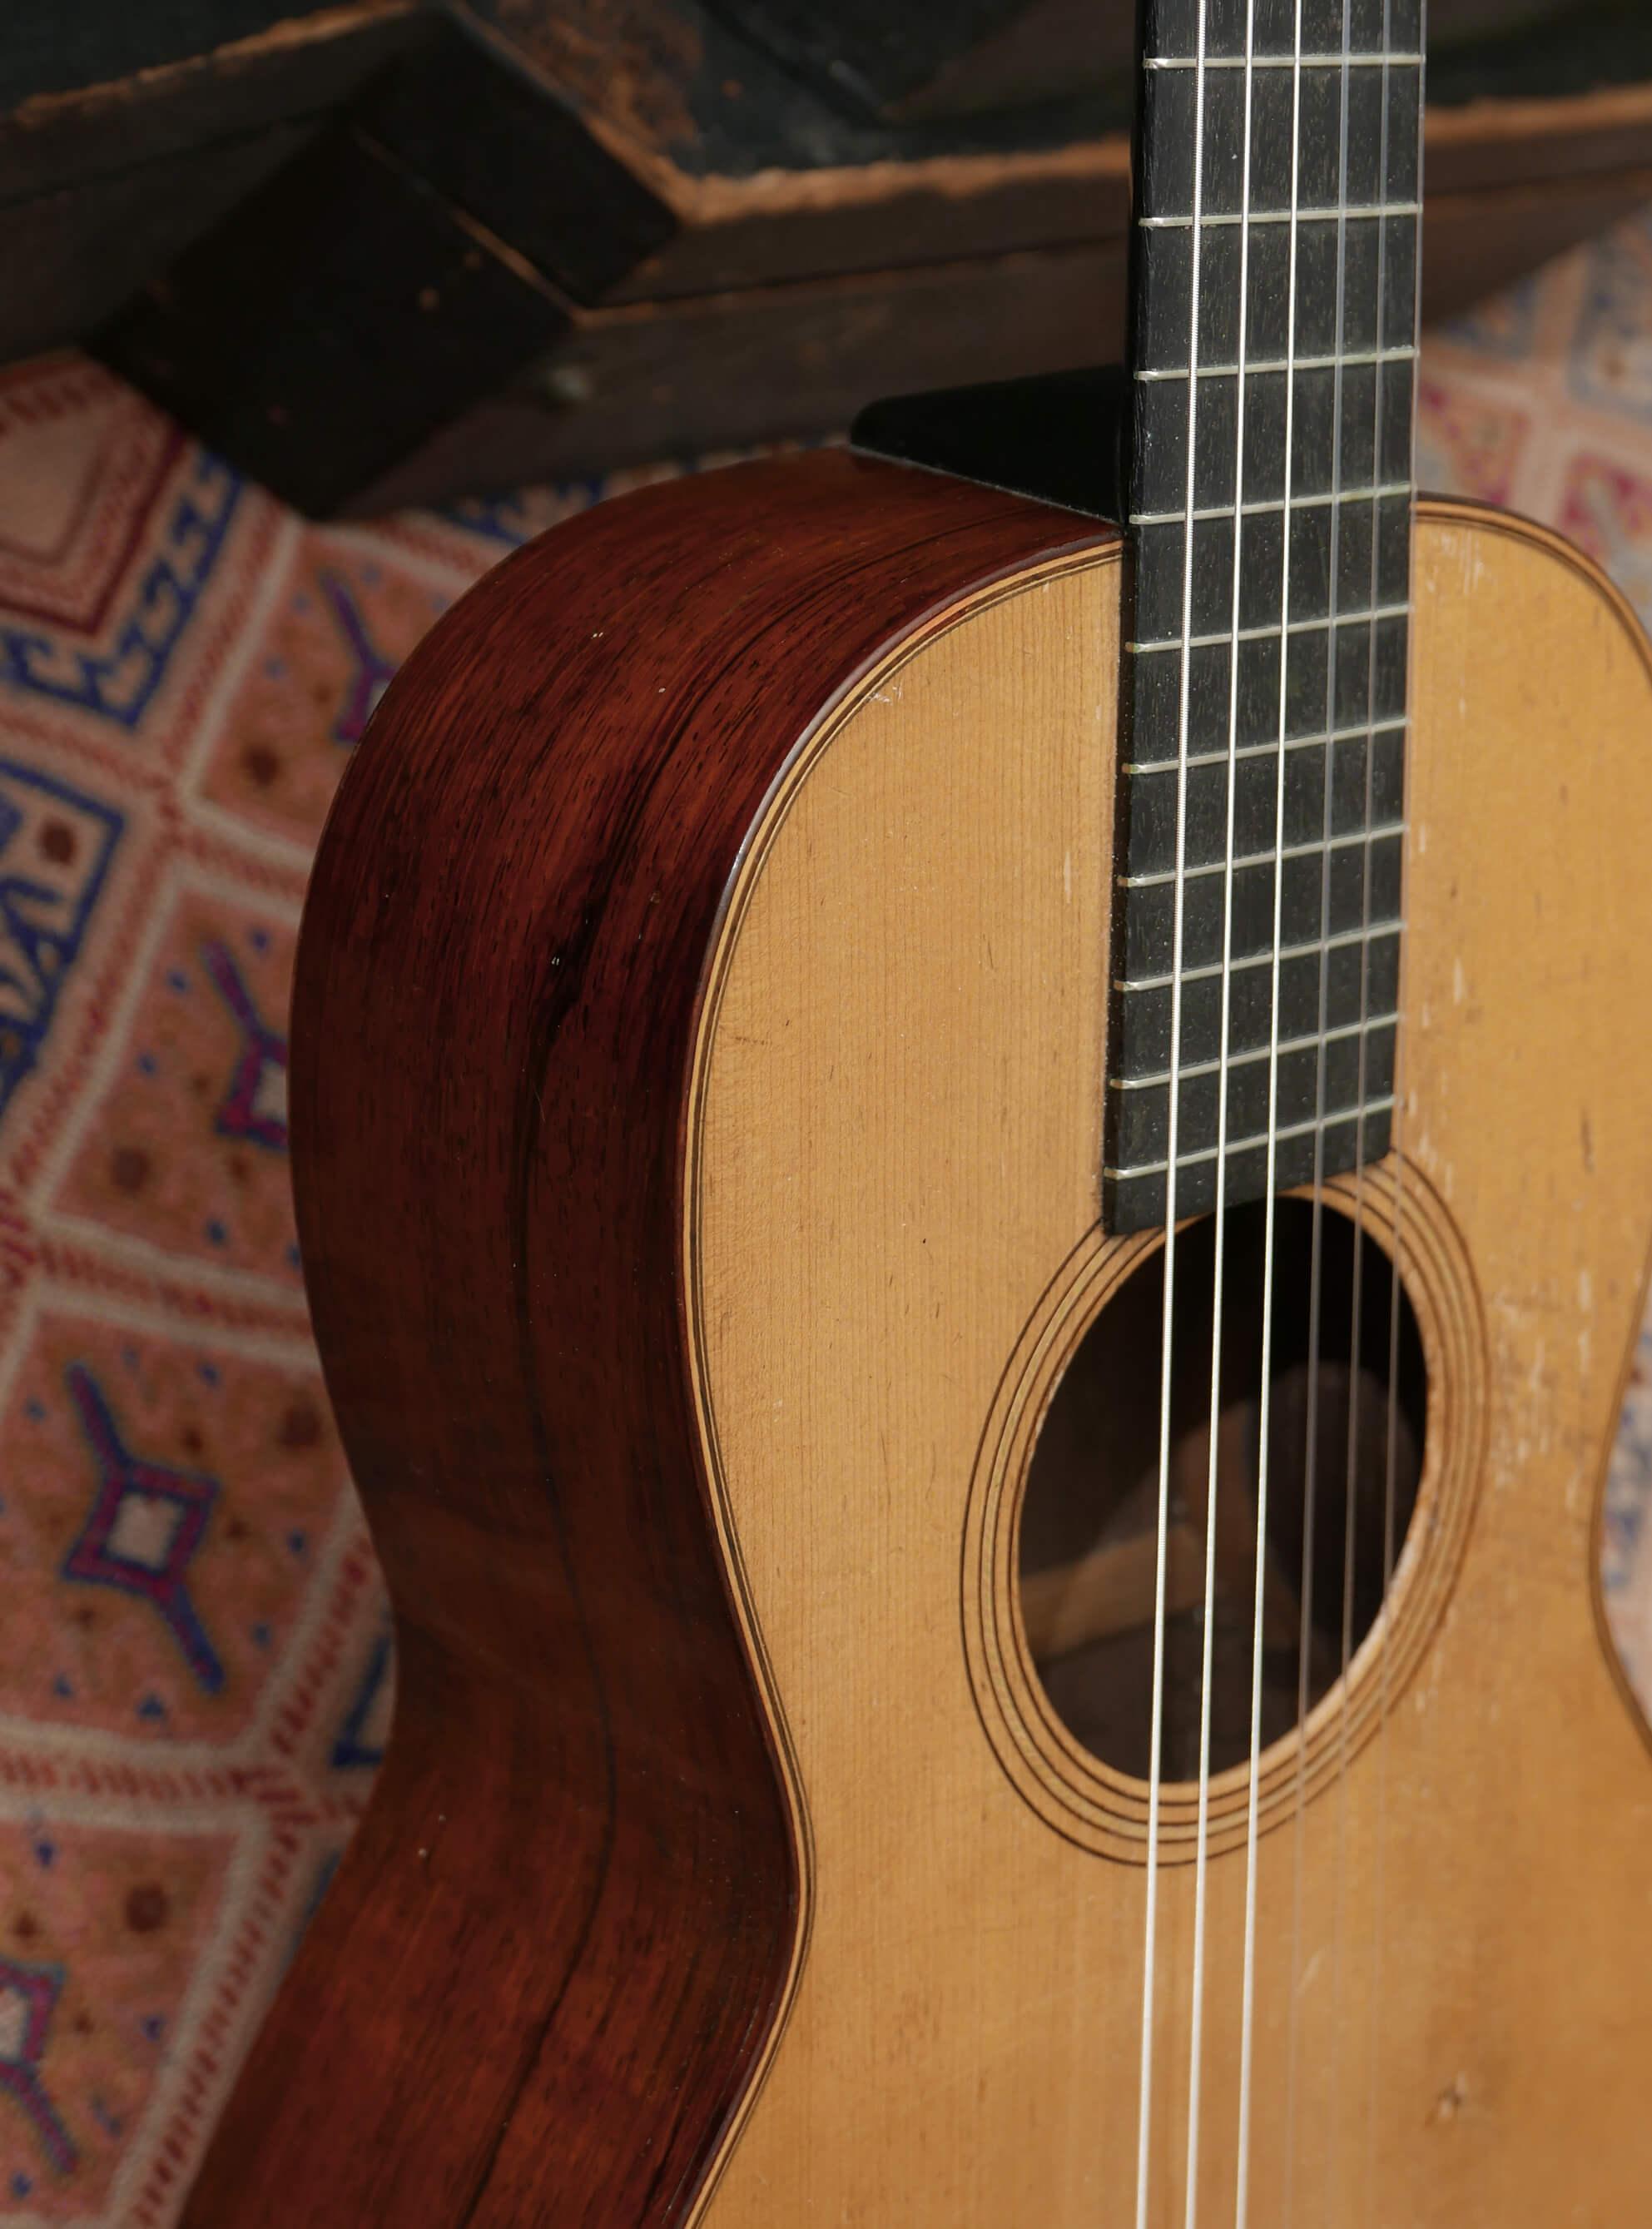 1869 Martin 2 1/2-17 Guitar, Brazilian Rosewood - Vintage American